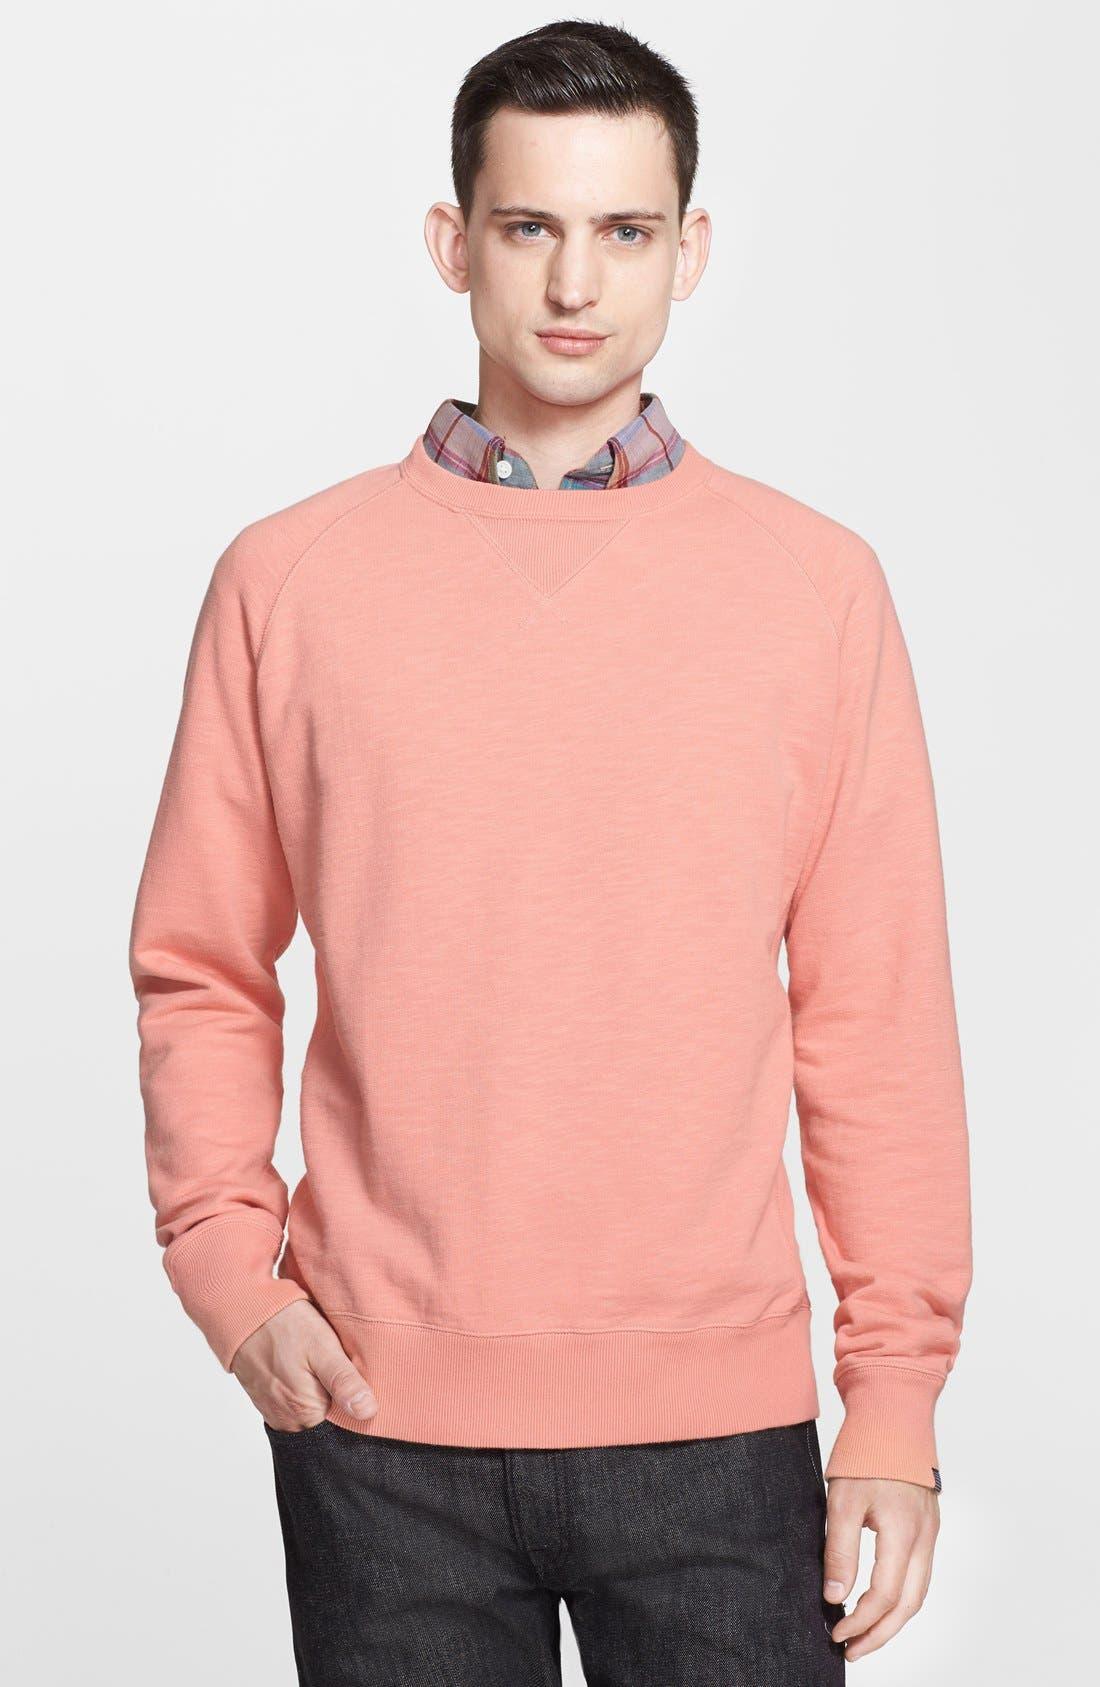 Alternate Image 1 Selected - Jack Spade 'Price' Crewneck Sweatshirt